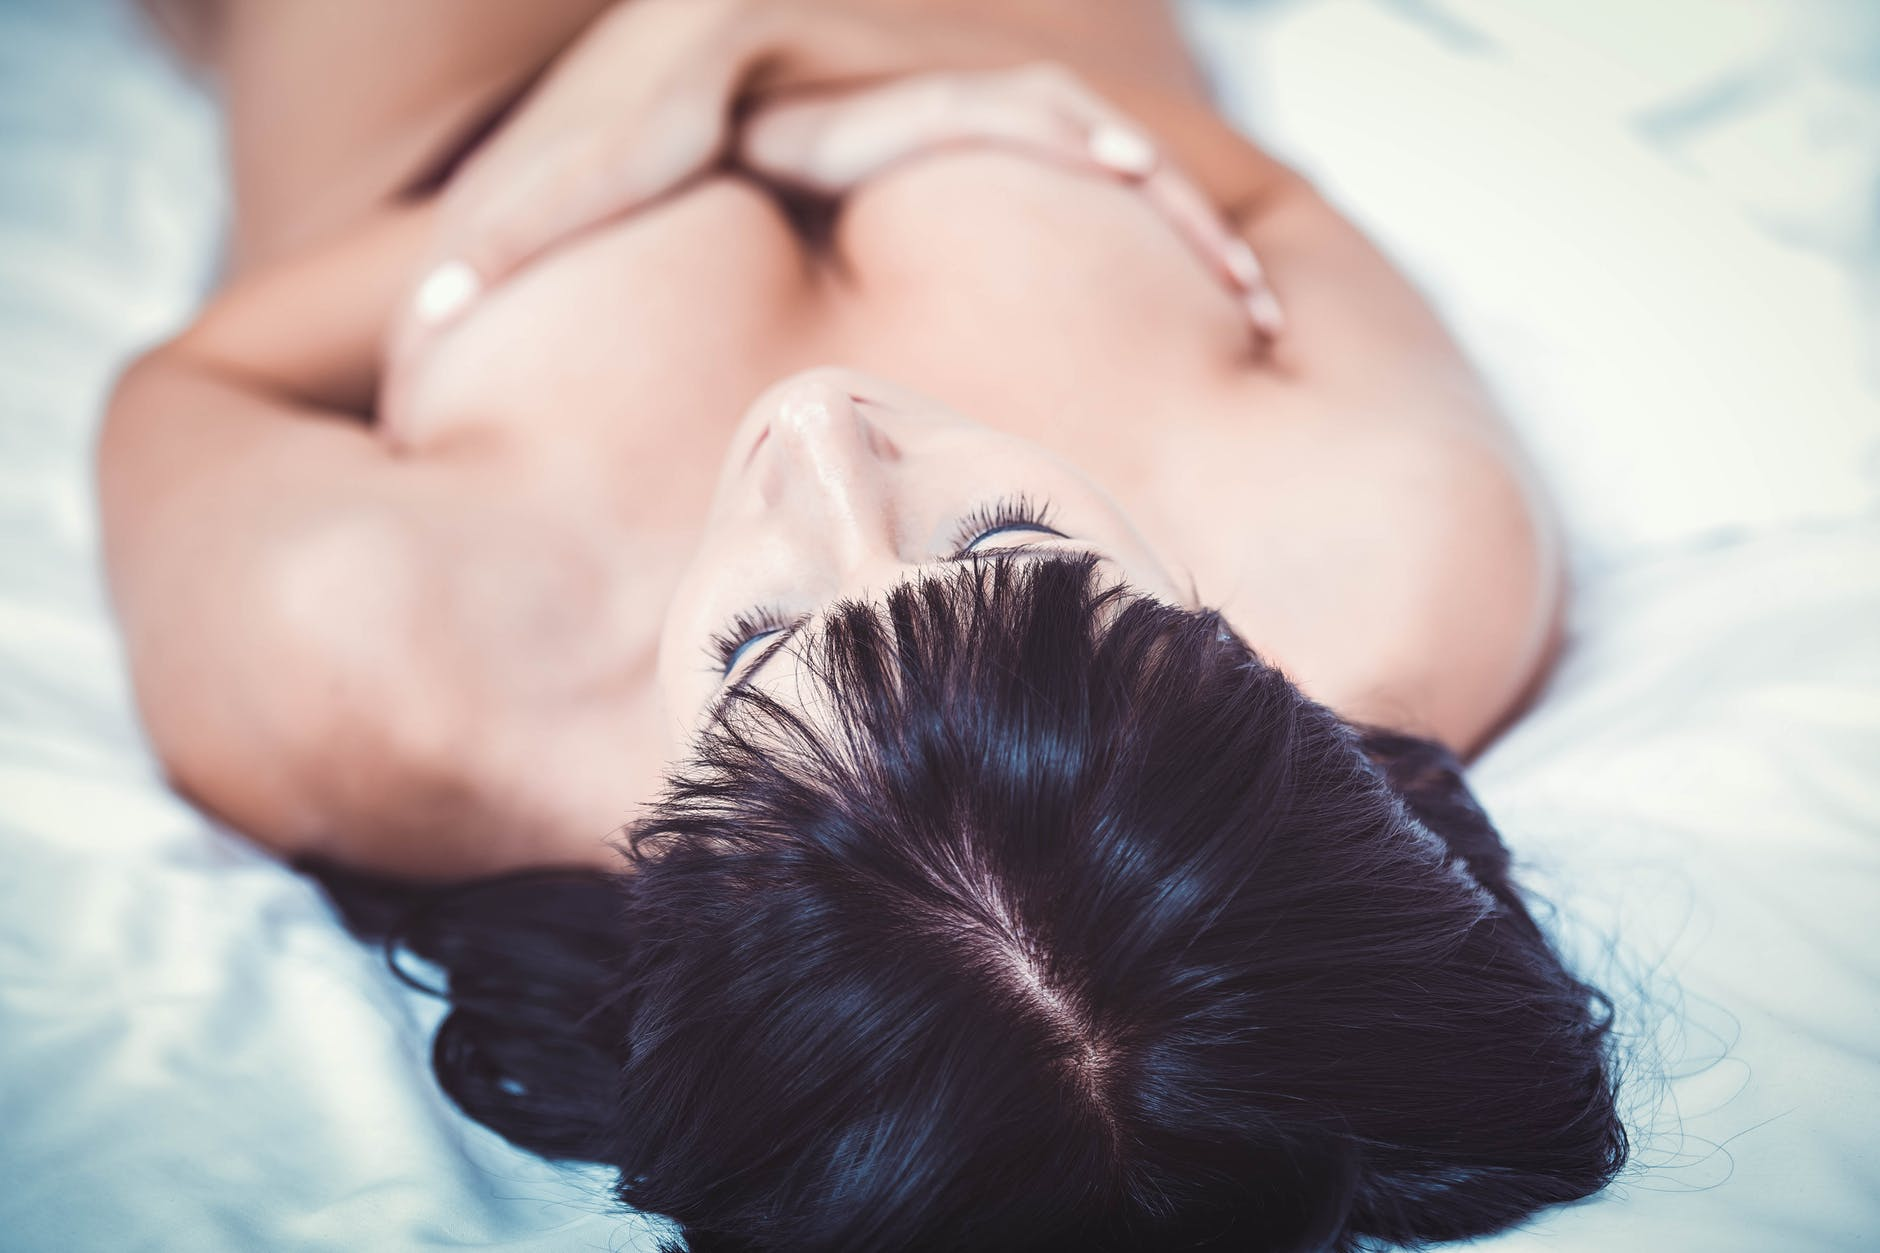 femme nue lit